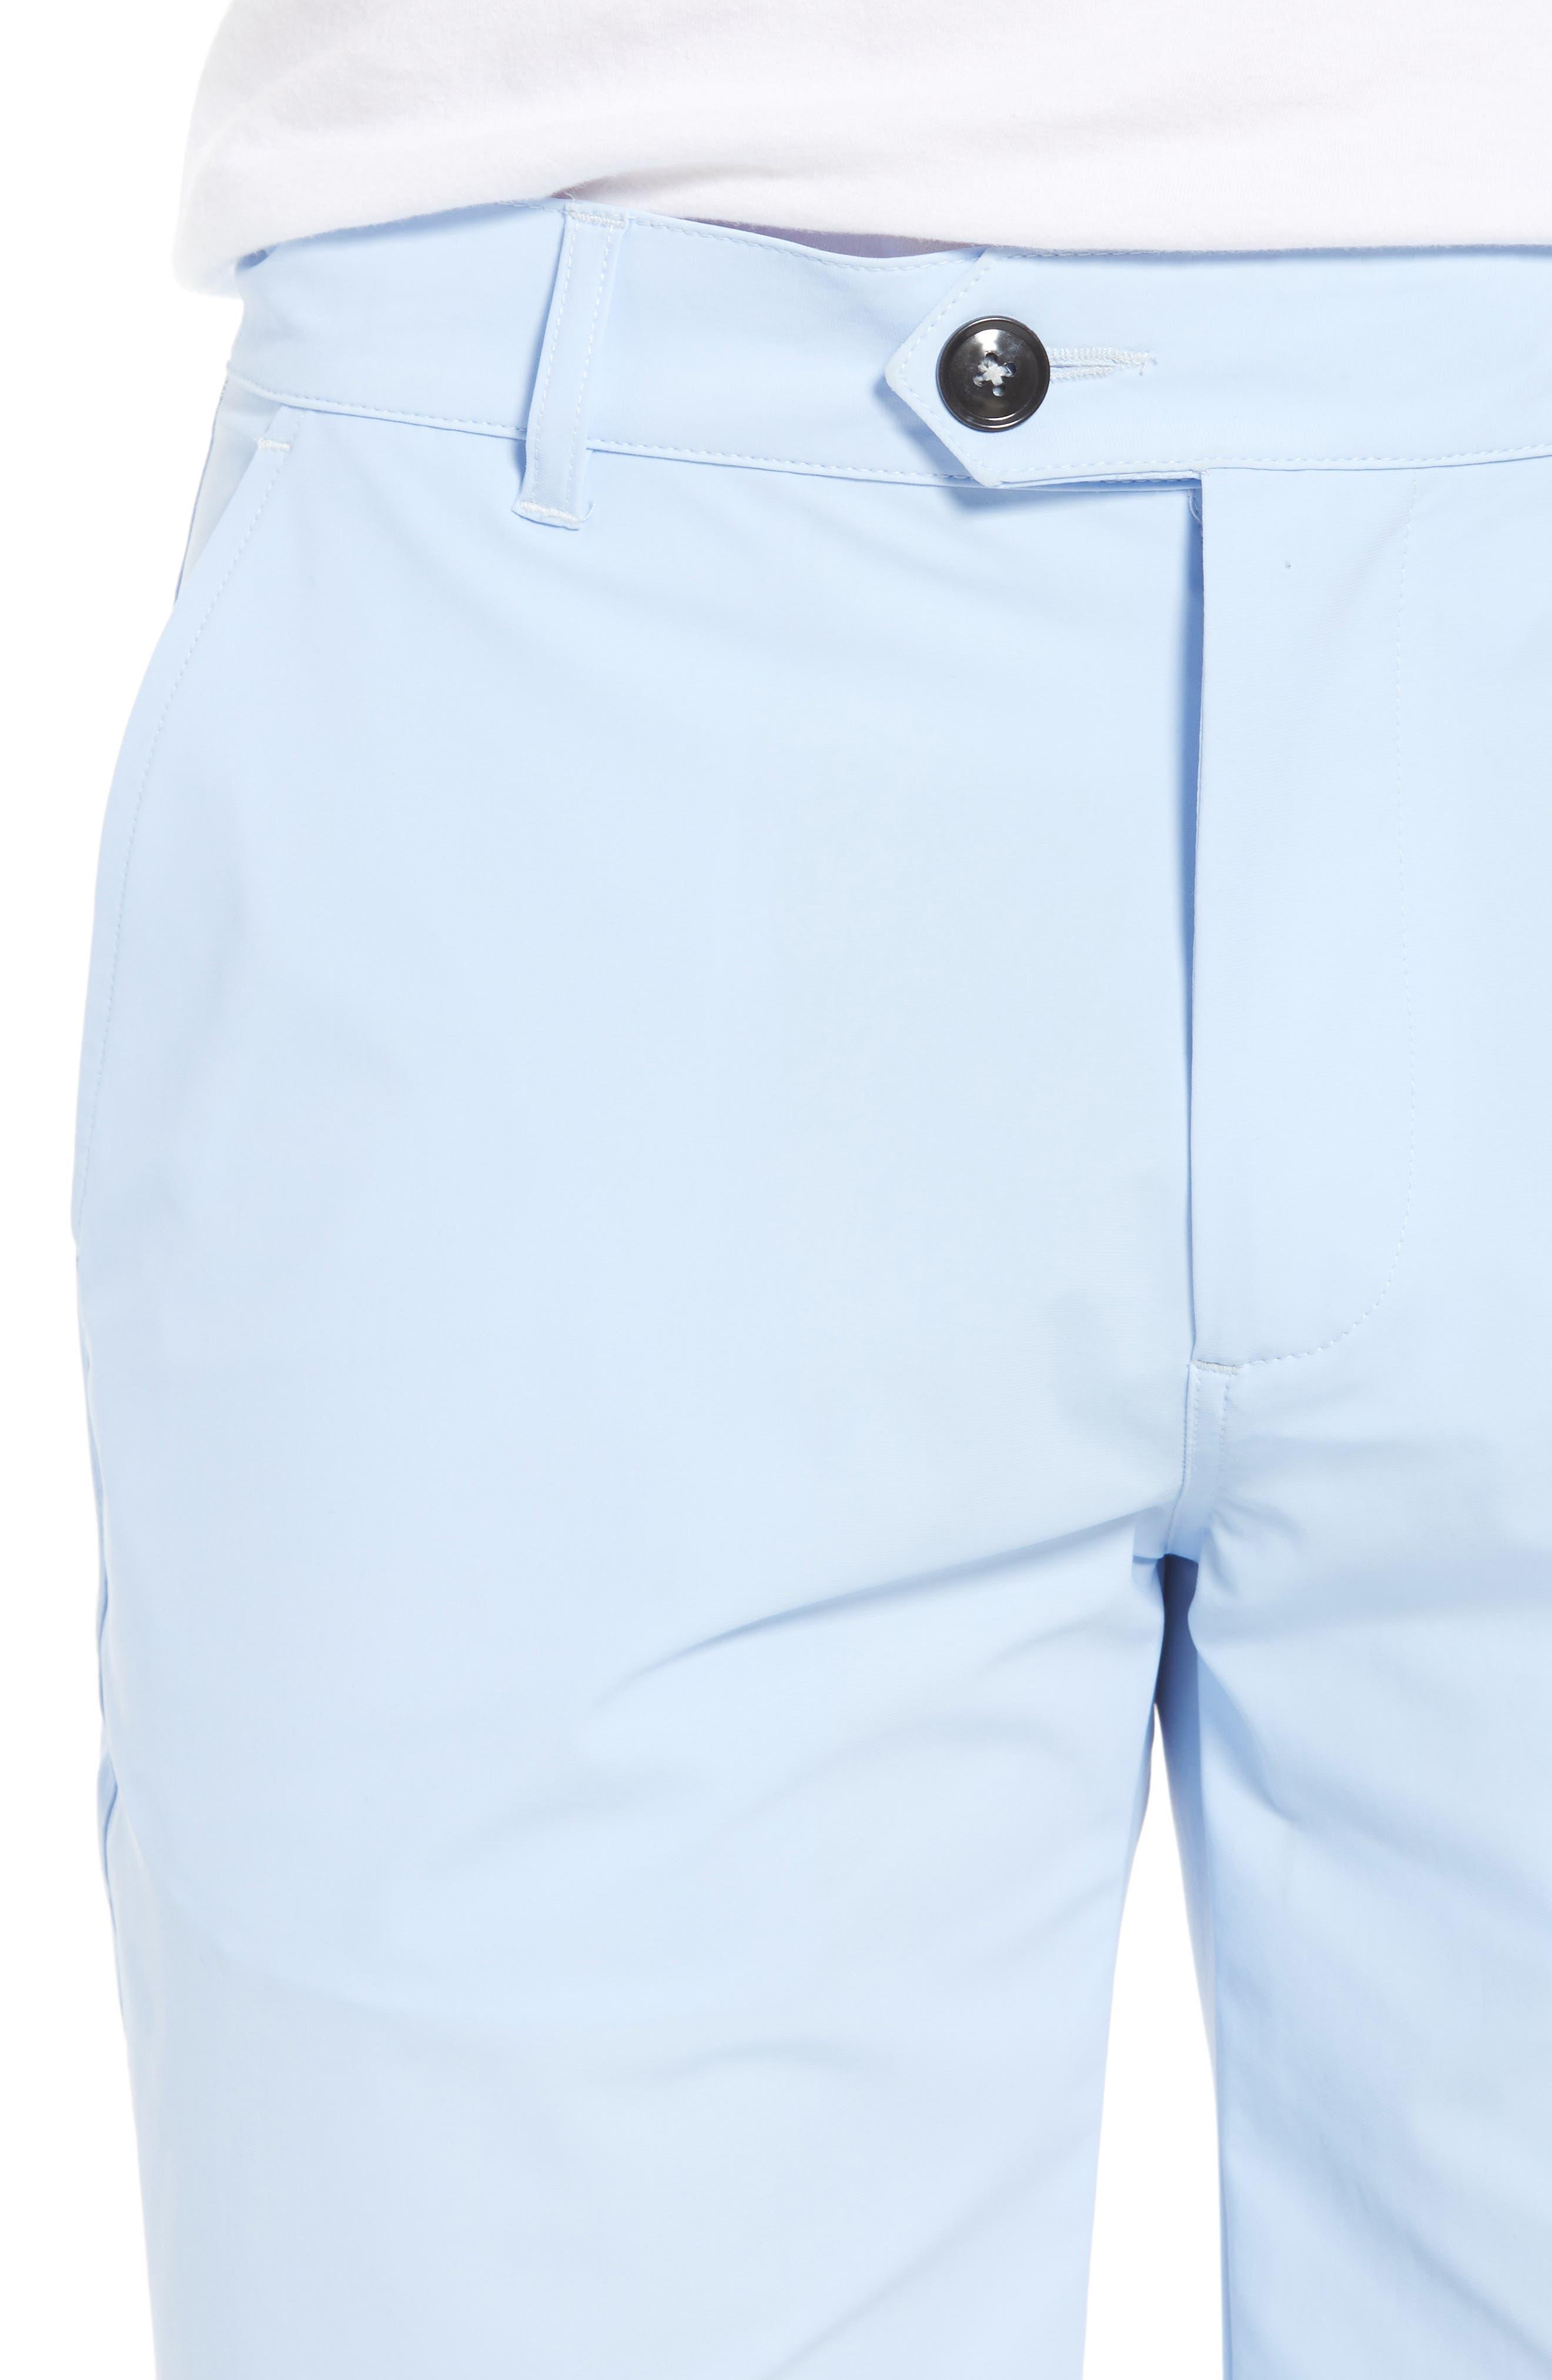 Montauk Shorts,                             Alternate thumbnail 4, color,                             WOLF